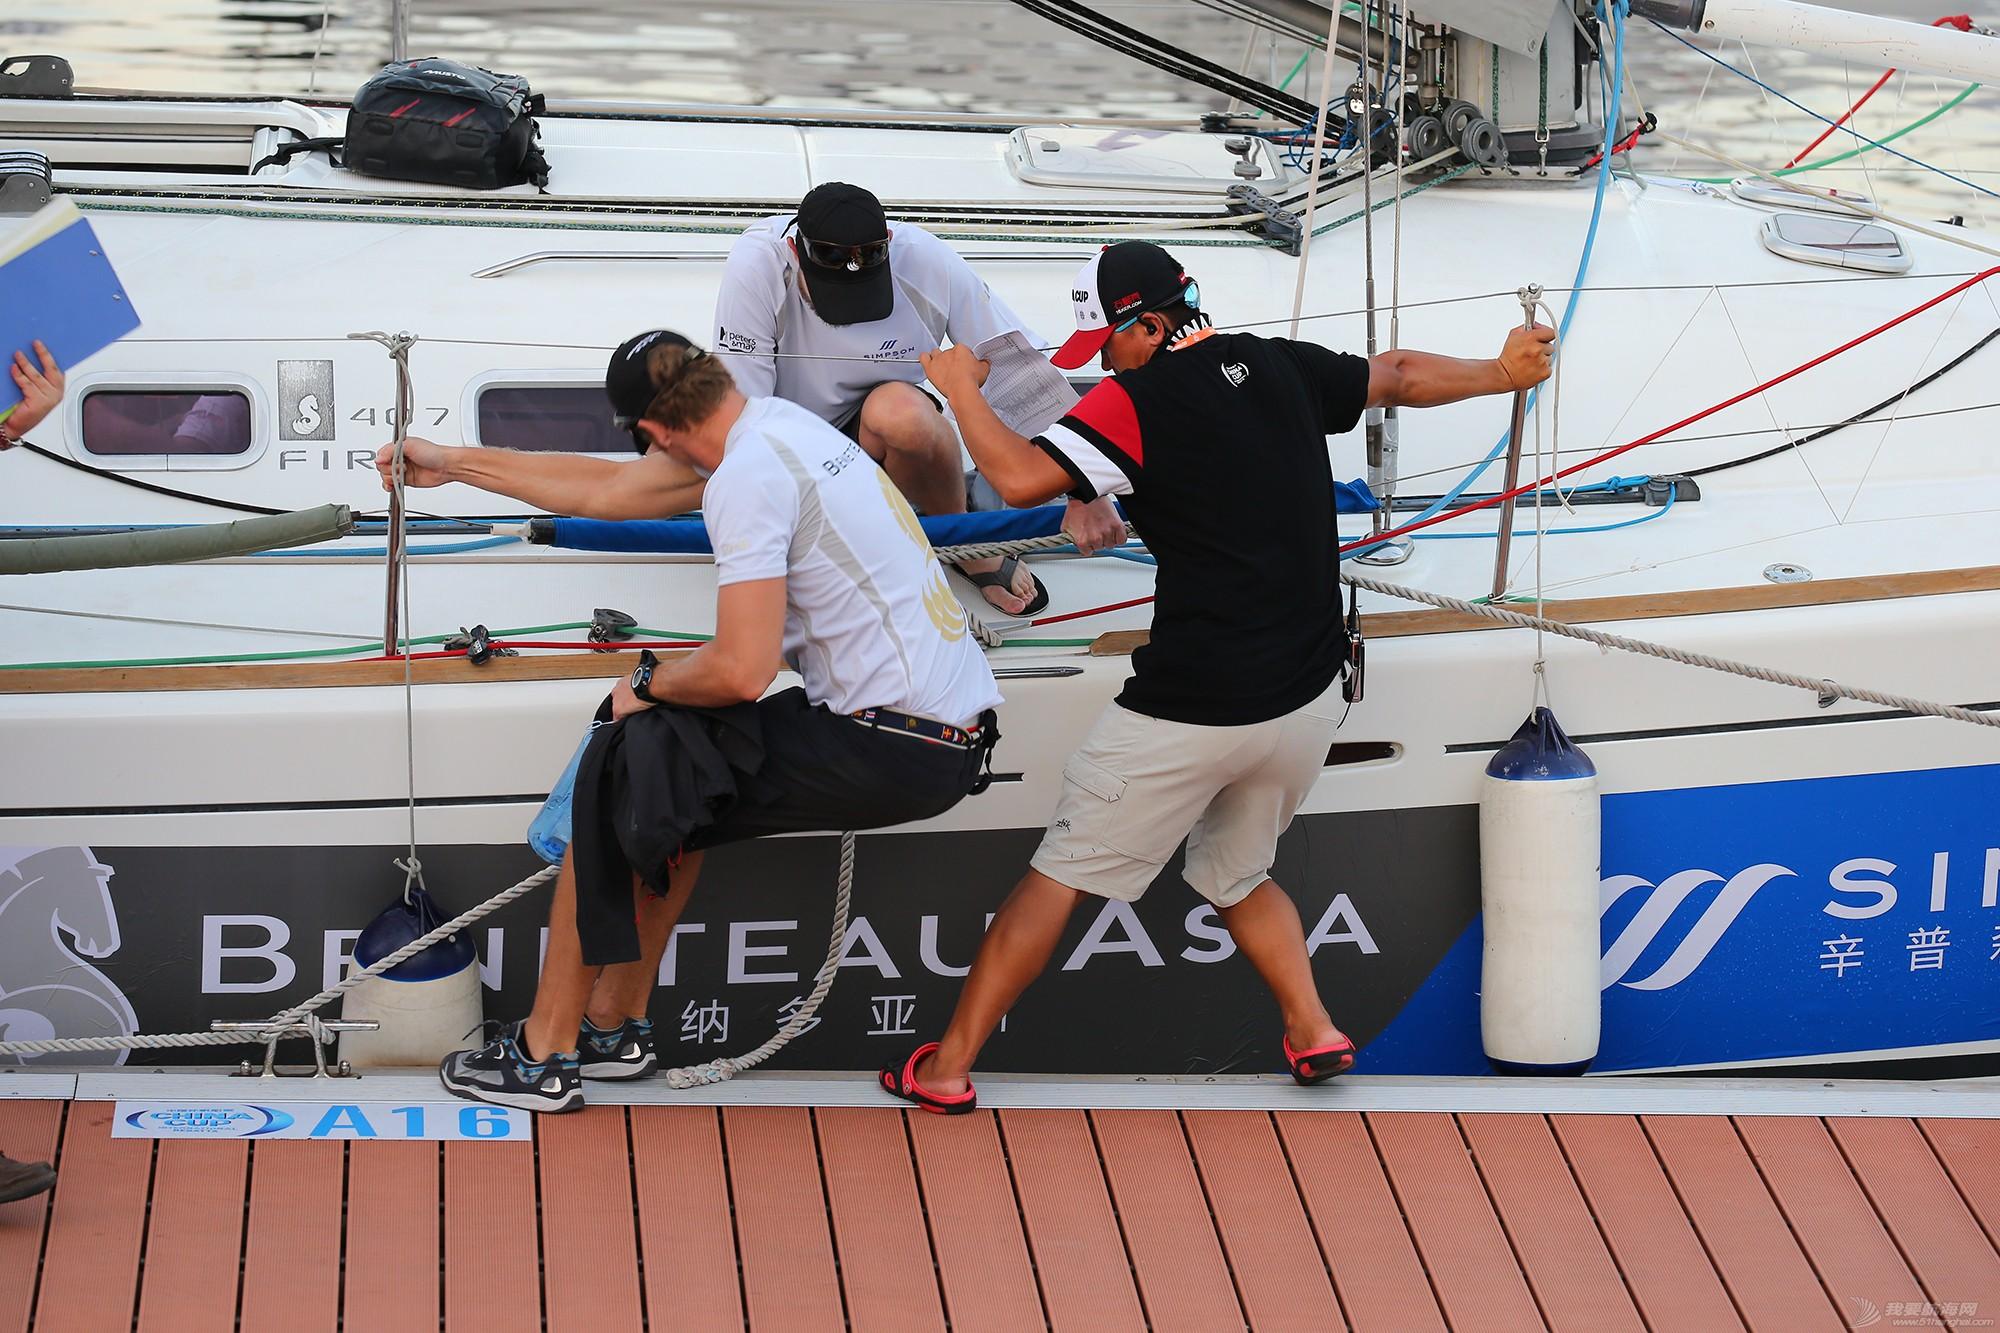 Insurance,菲律宾,辛普森,拉力赛,Black,Insurance 中国杯帆船赛首日,辛普森深港拉力赛波澜不惊 E78W4040.JPG